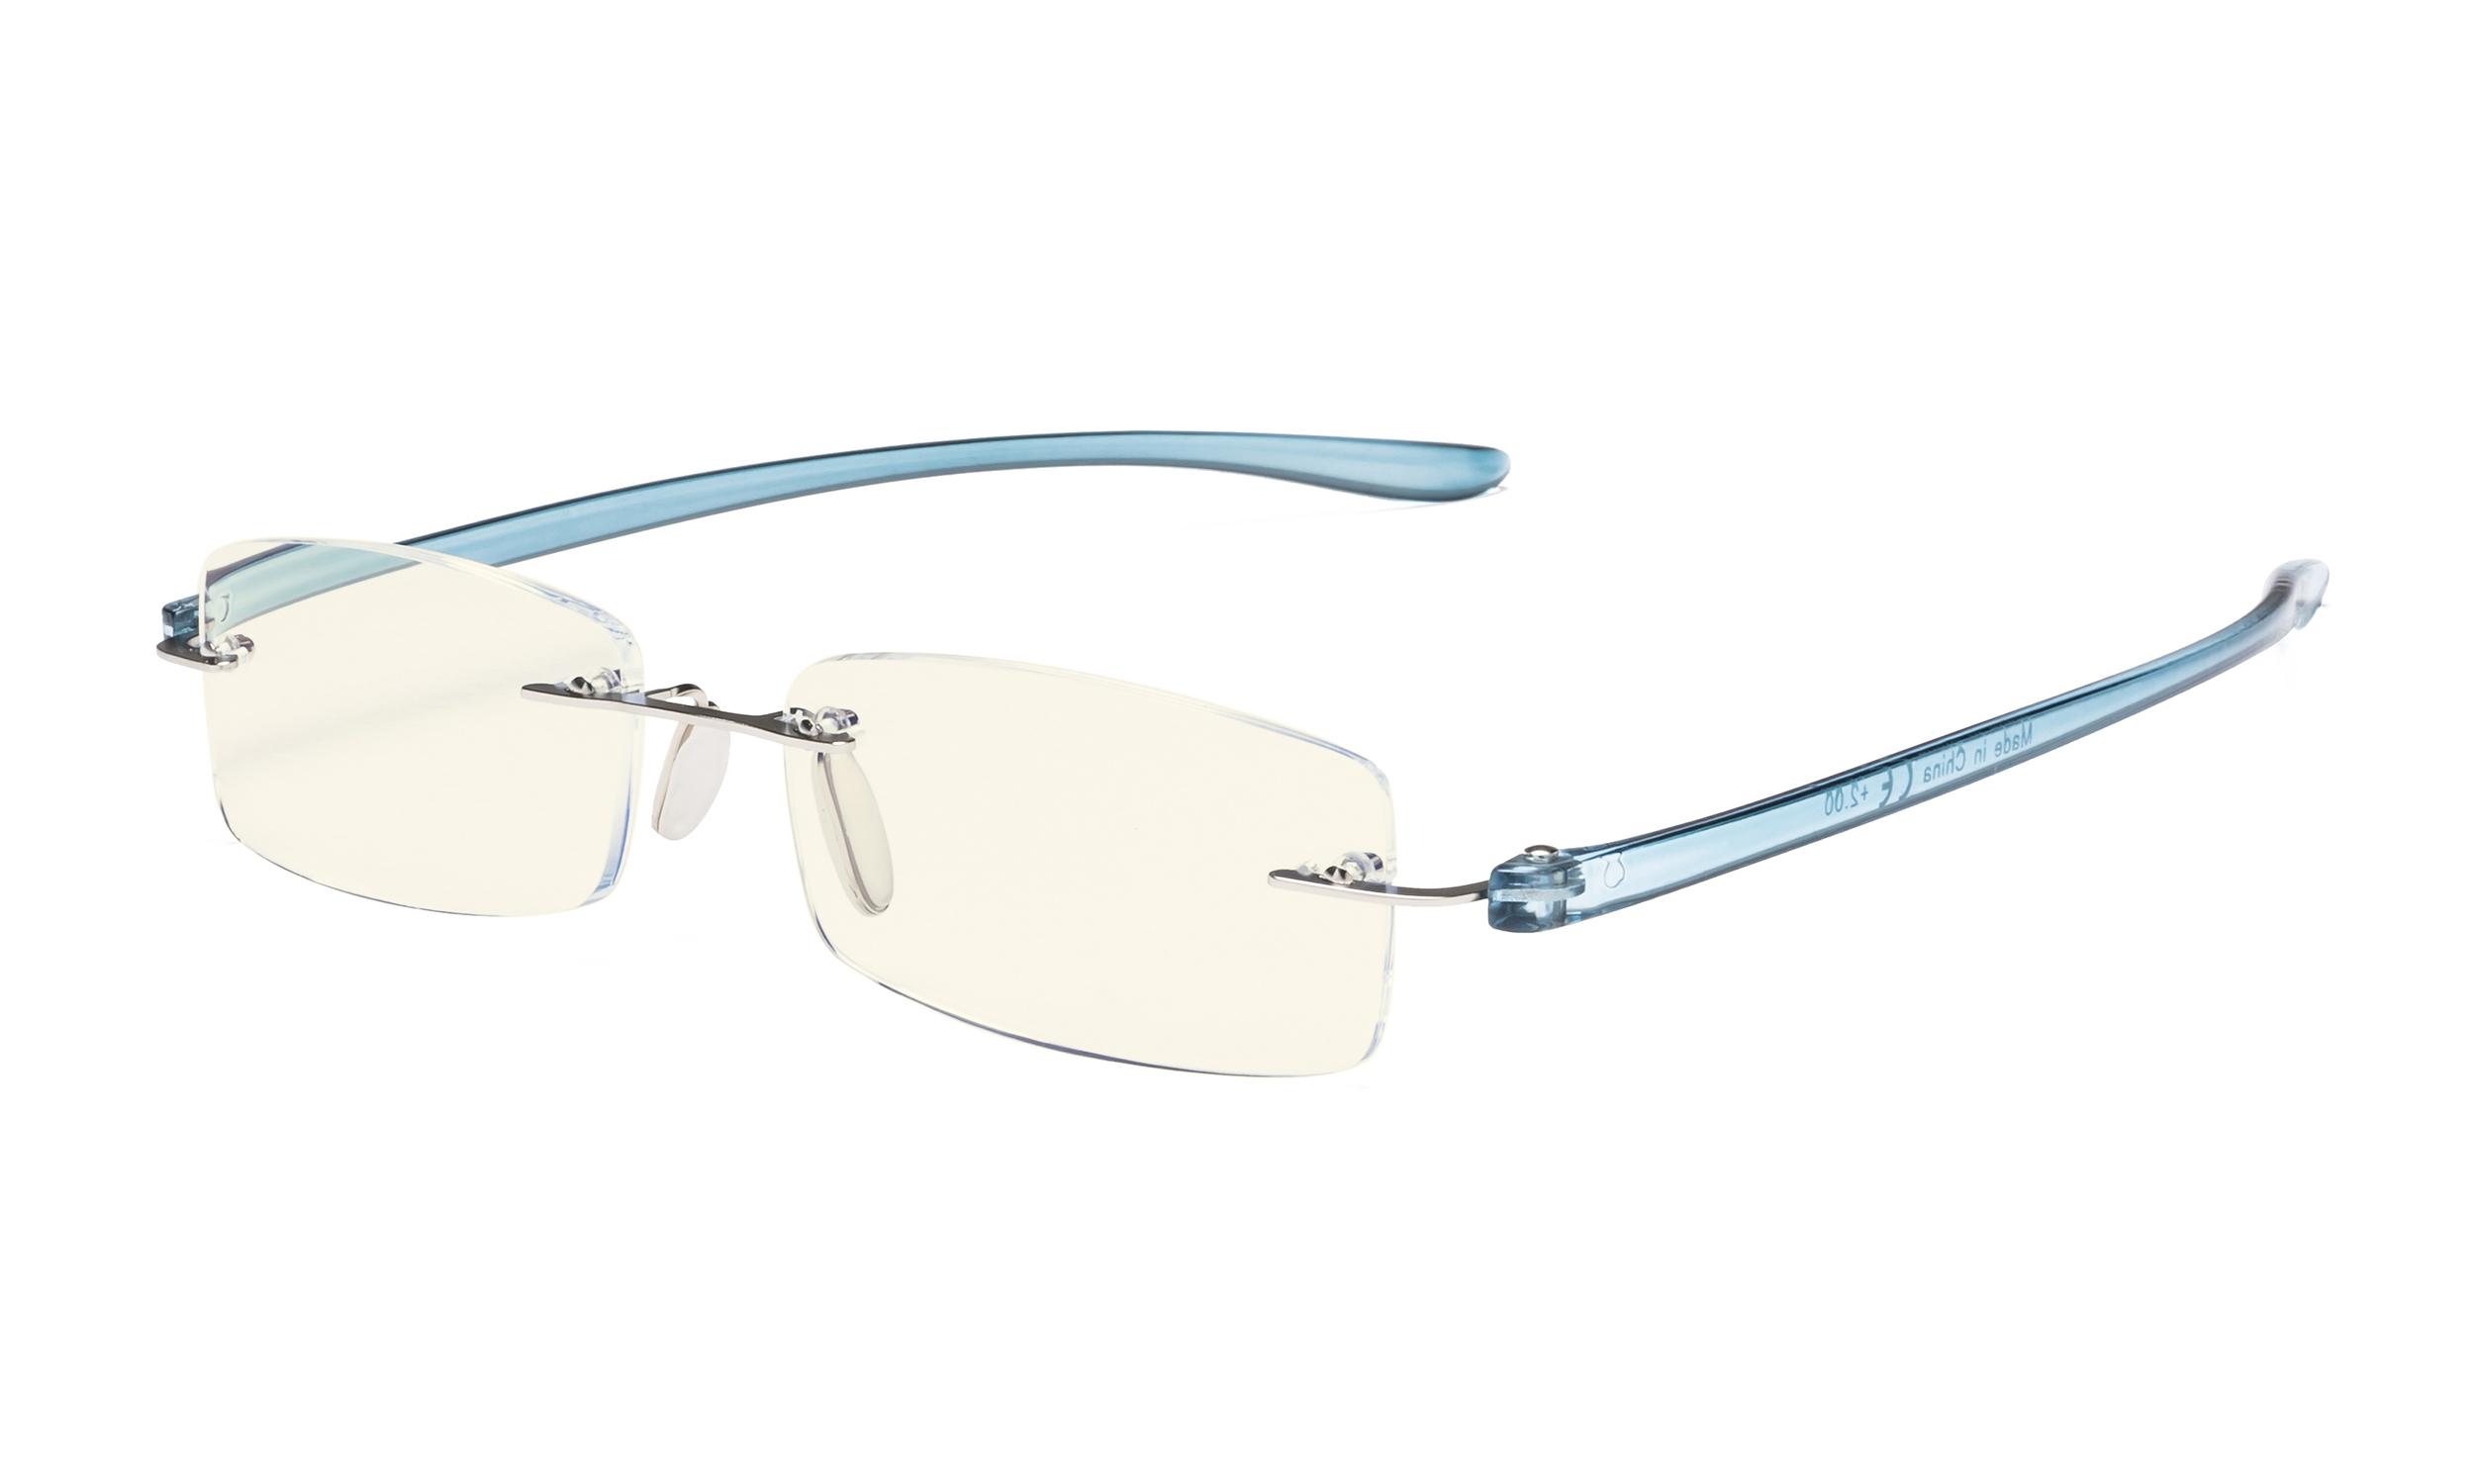 6bb19cf4da61 Eyekepper Computer Reading Glasses Blue Light Filter Rimless Readers UV  Protection Blue Arm UVCG1